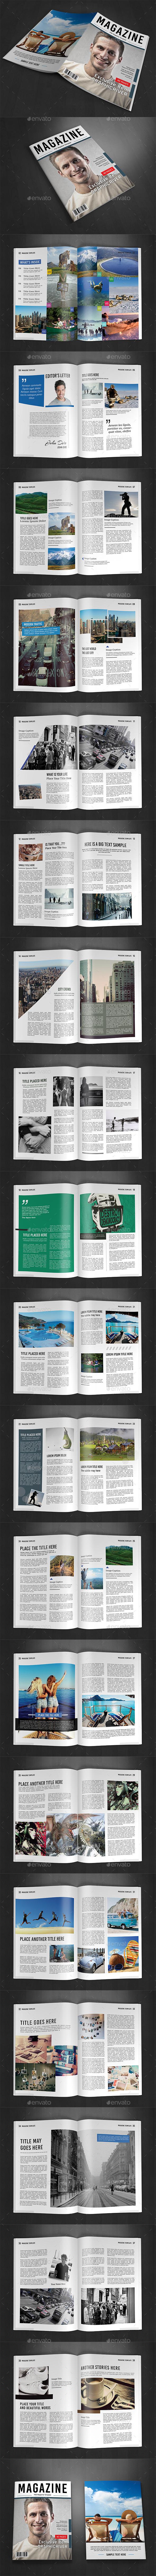 A4 Magazine Template Vol.10 - Magazines Print Templates